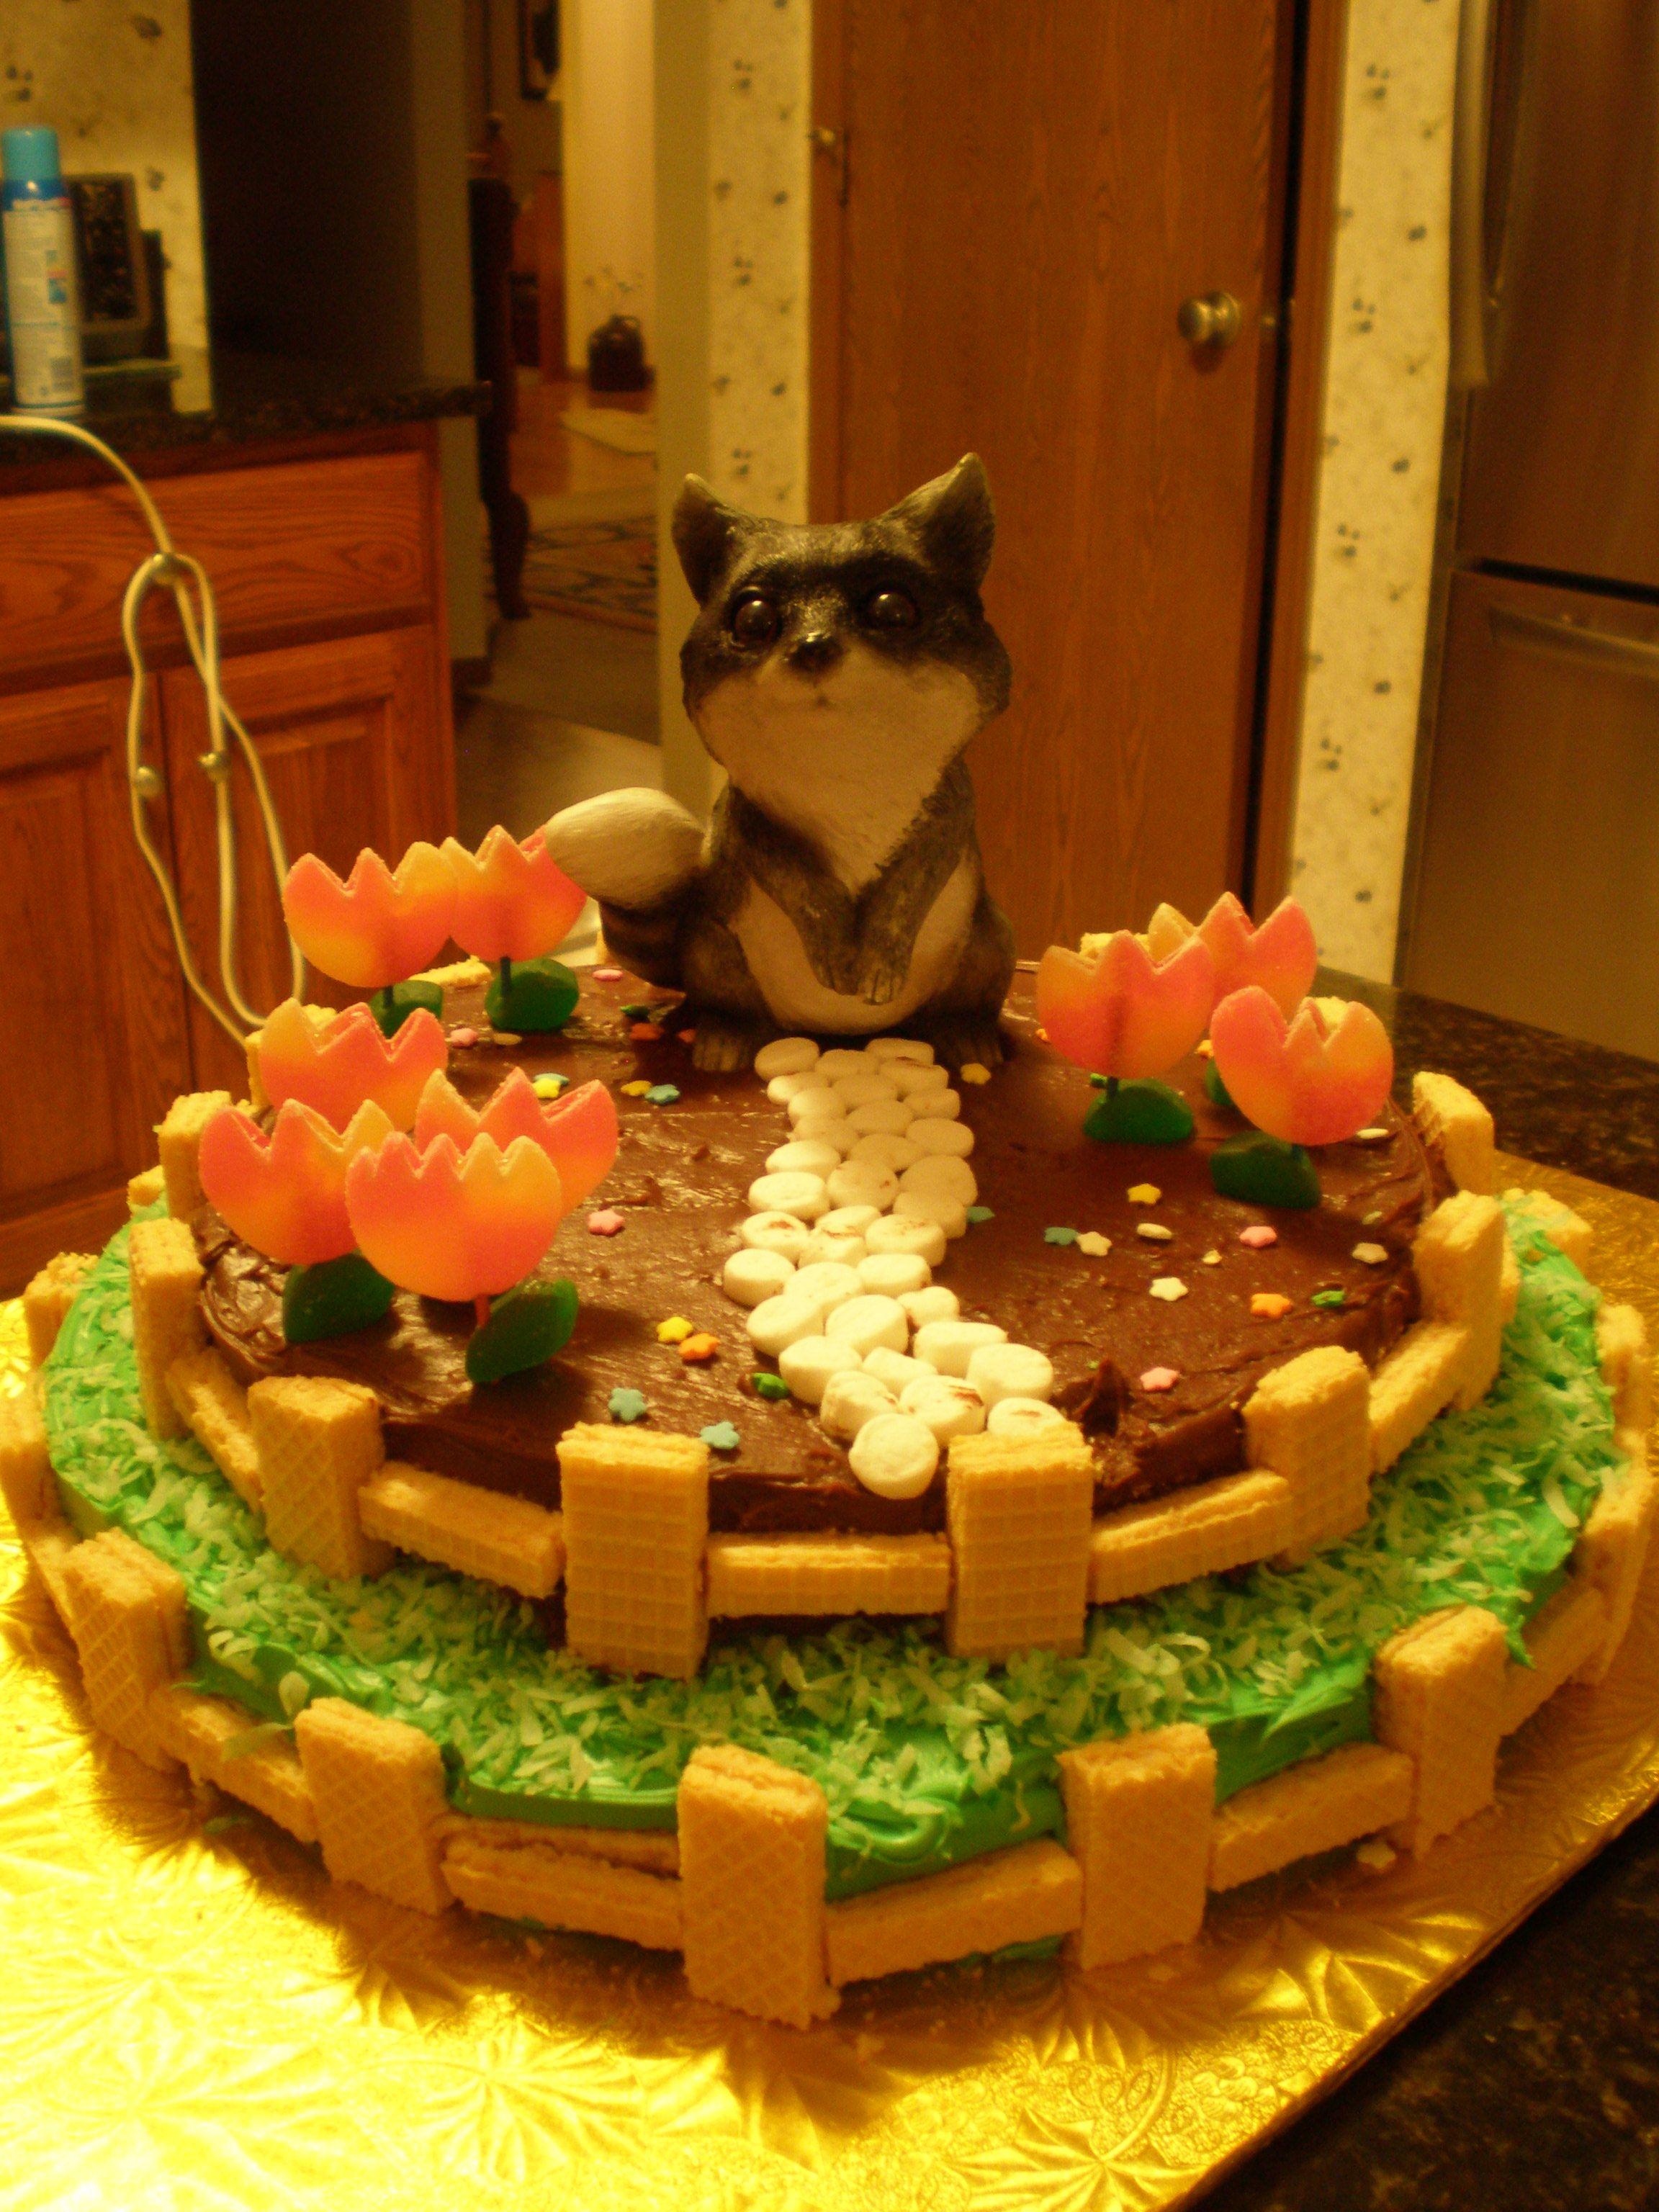 Raccoon Cake we decorated | My Sweets! | Pinterest | Cake ... - photo#42